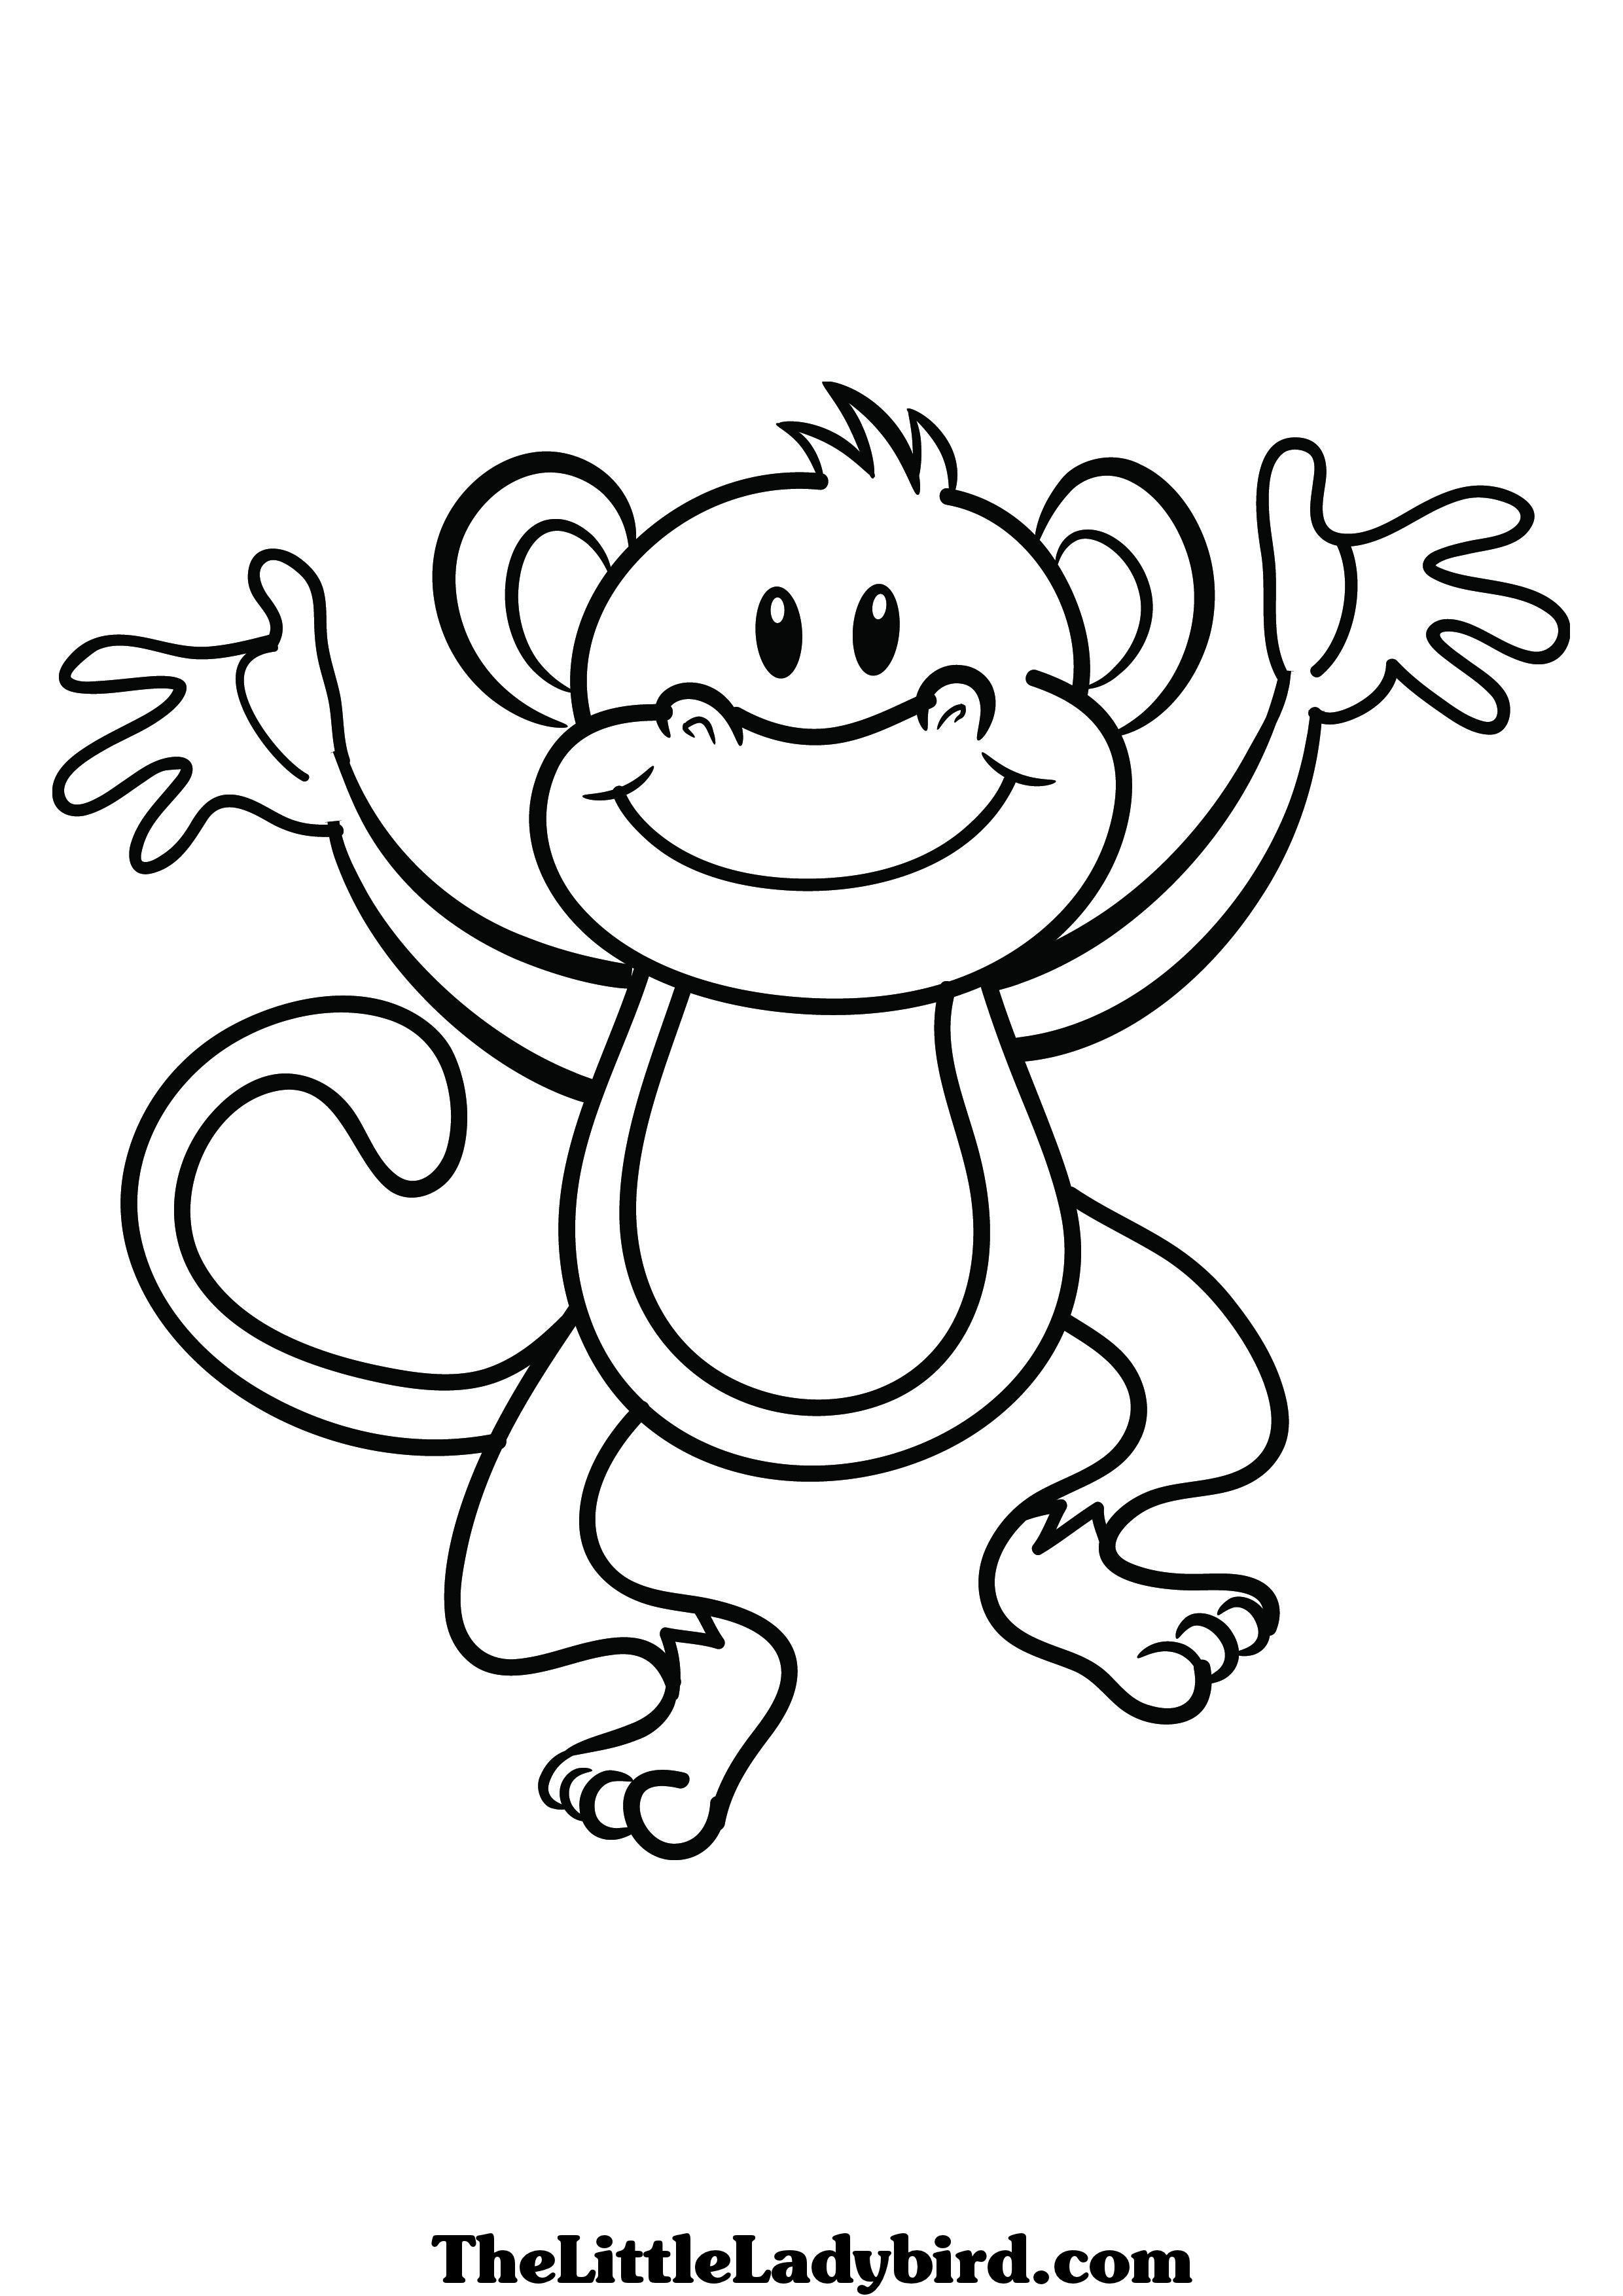 Monkey Coloring Page Free Large Images Monkey Coloring Pages Animal Coloring Pages Animal Templates